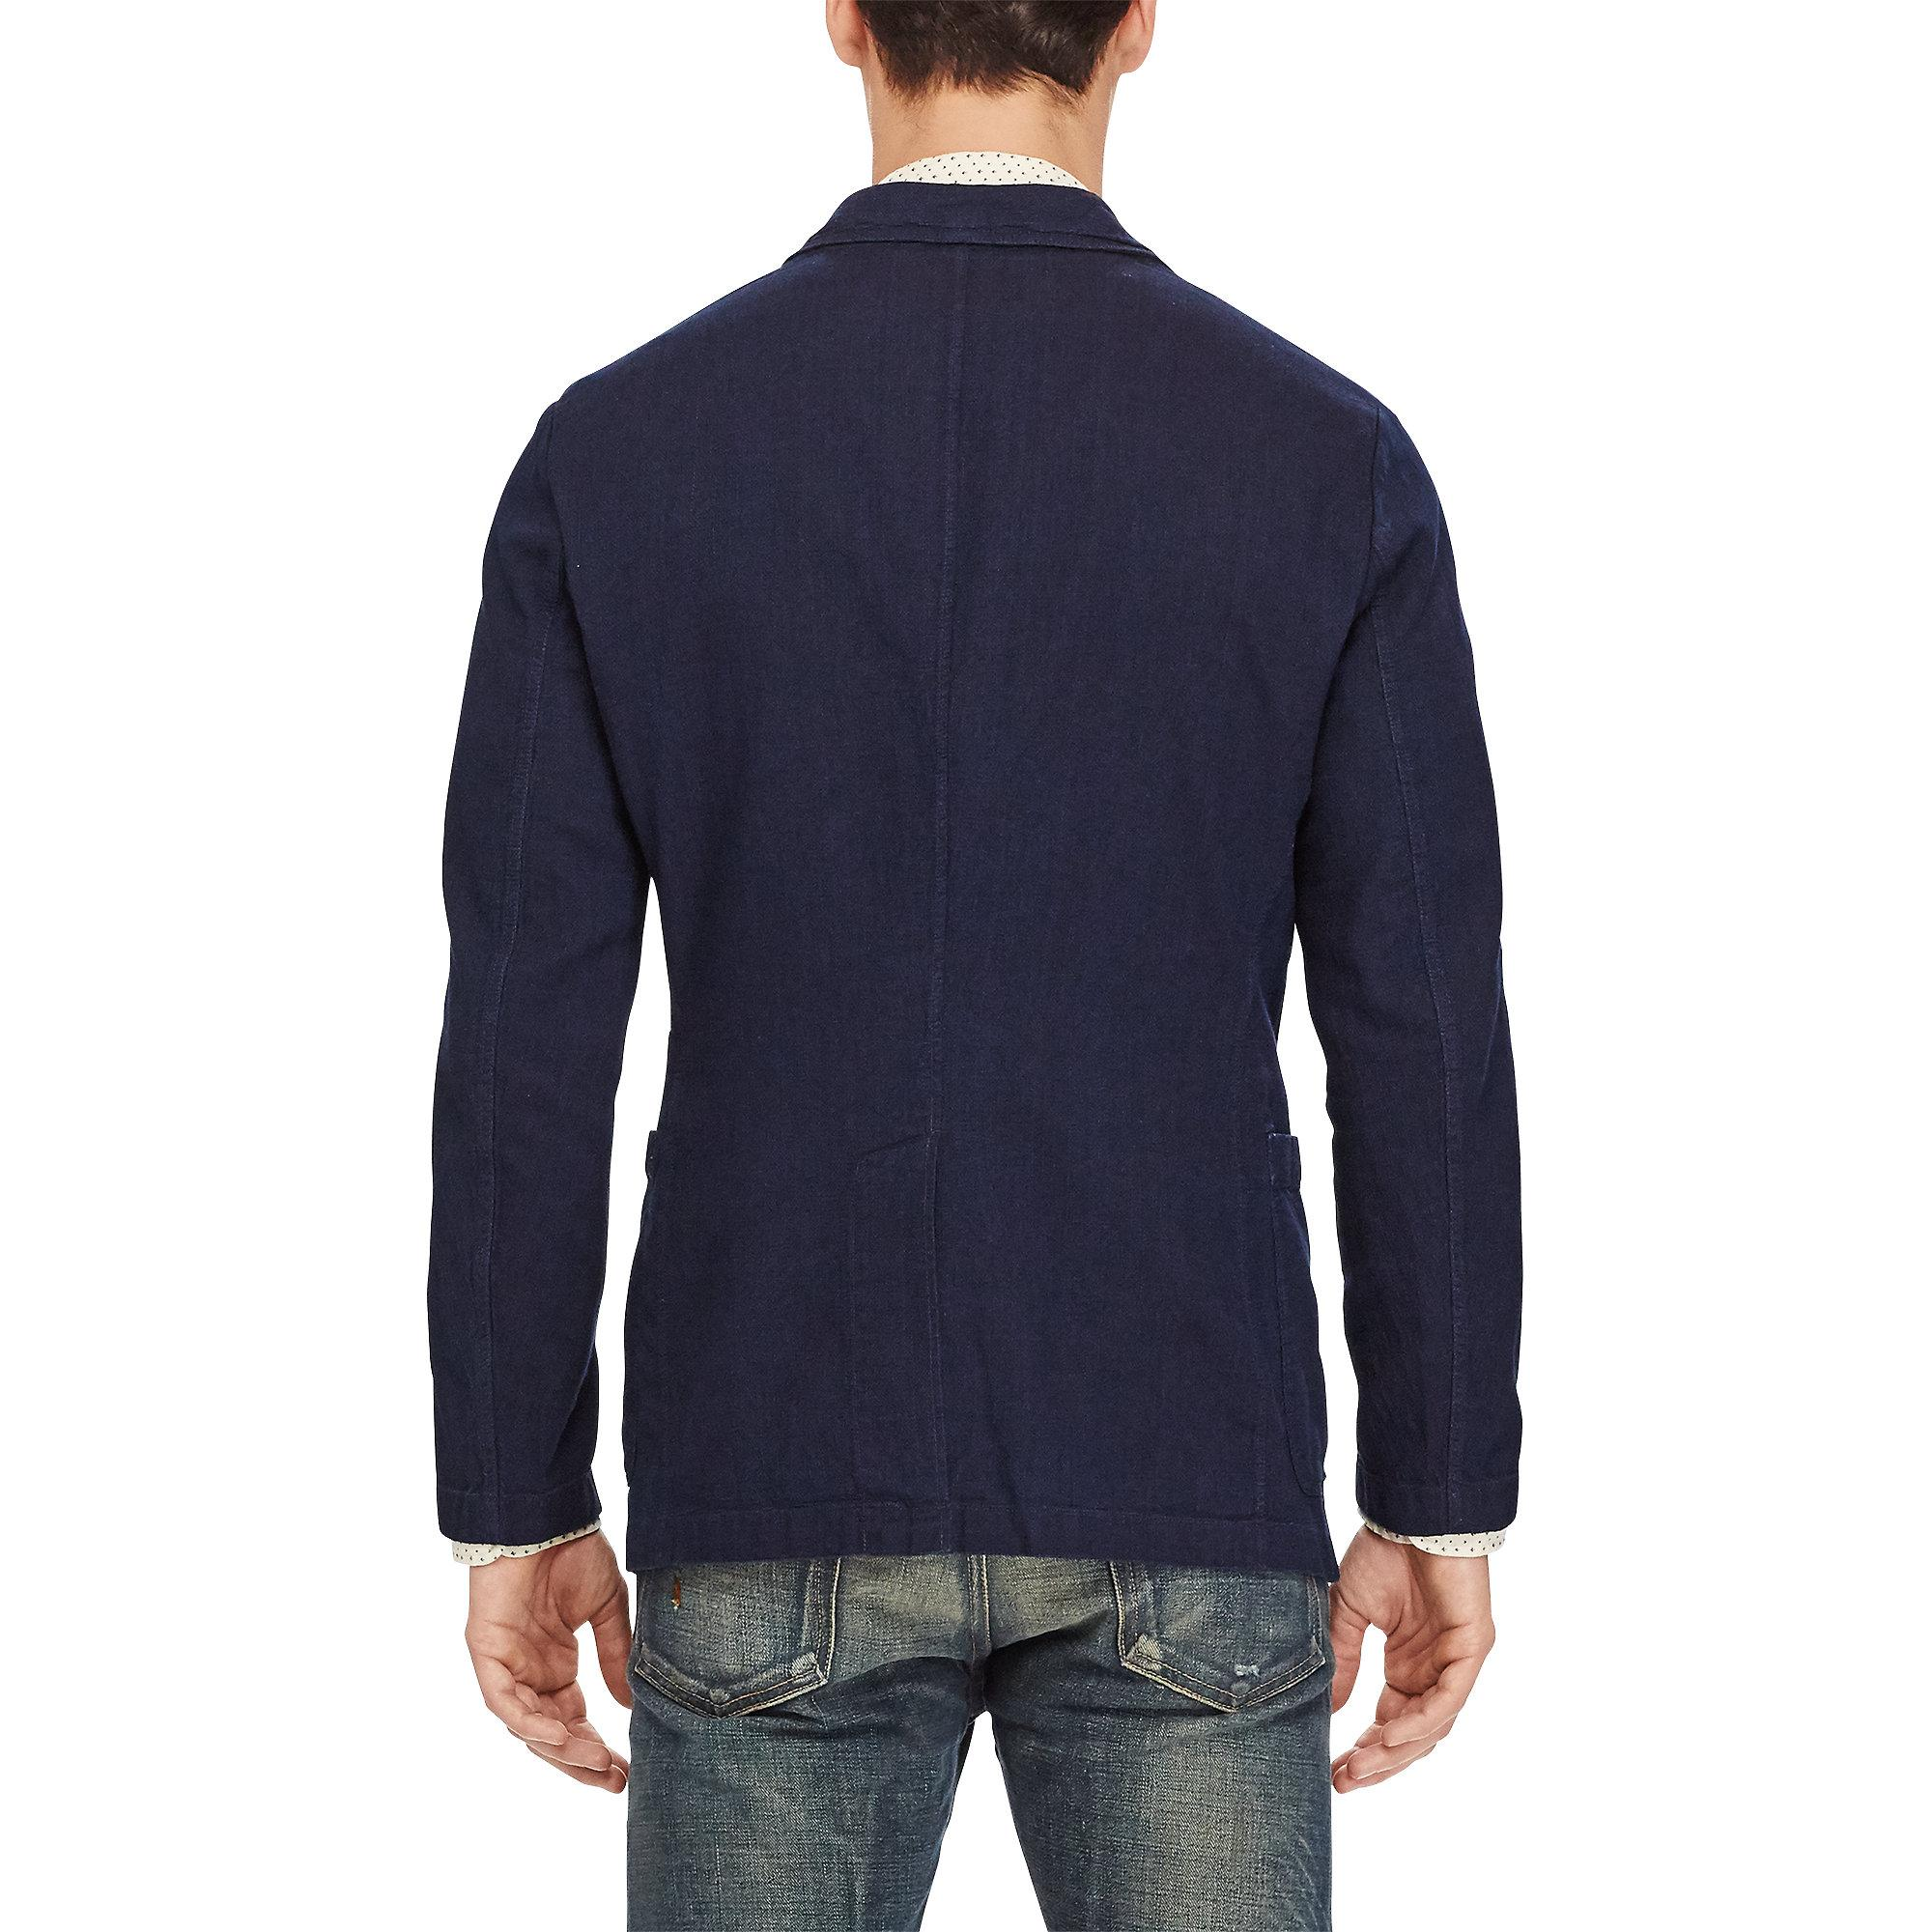 Indigo Jeans For Men